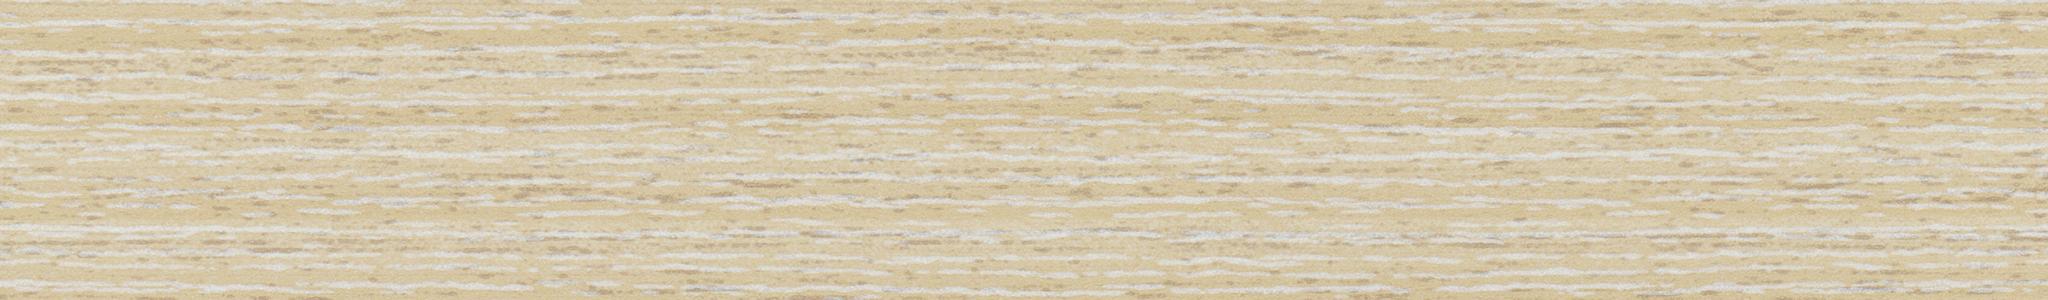 HD 262577 ABS hrana jasan Nobel perla